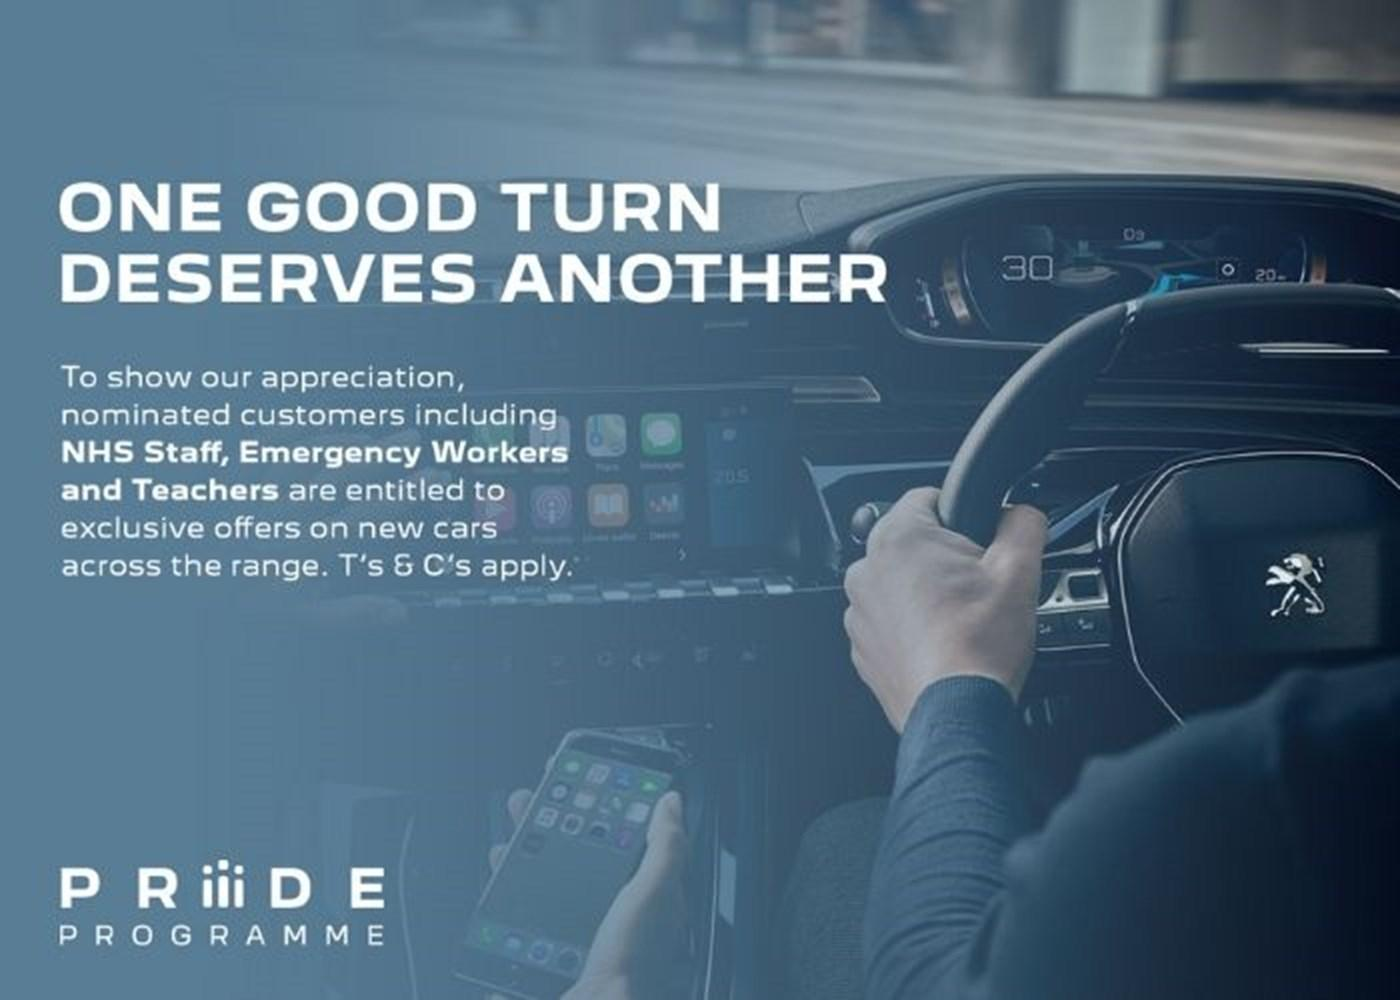 Peugeot Pride Scheme for NHS, Emergency Services, Teachers & Partners